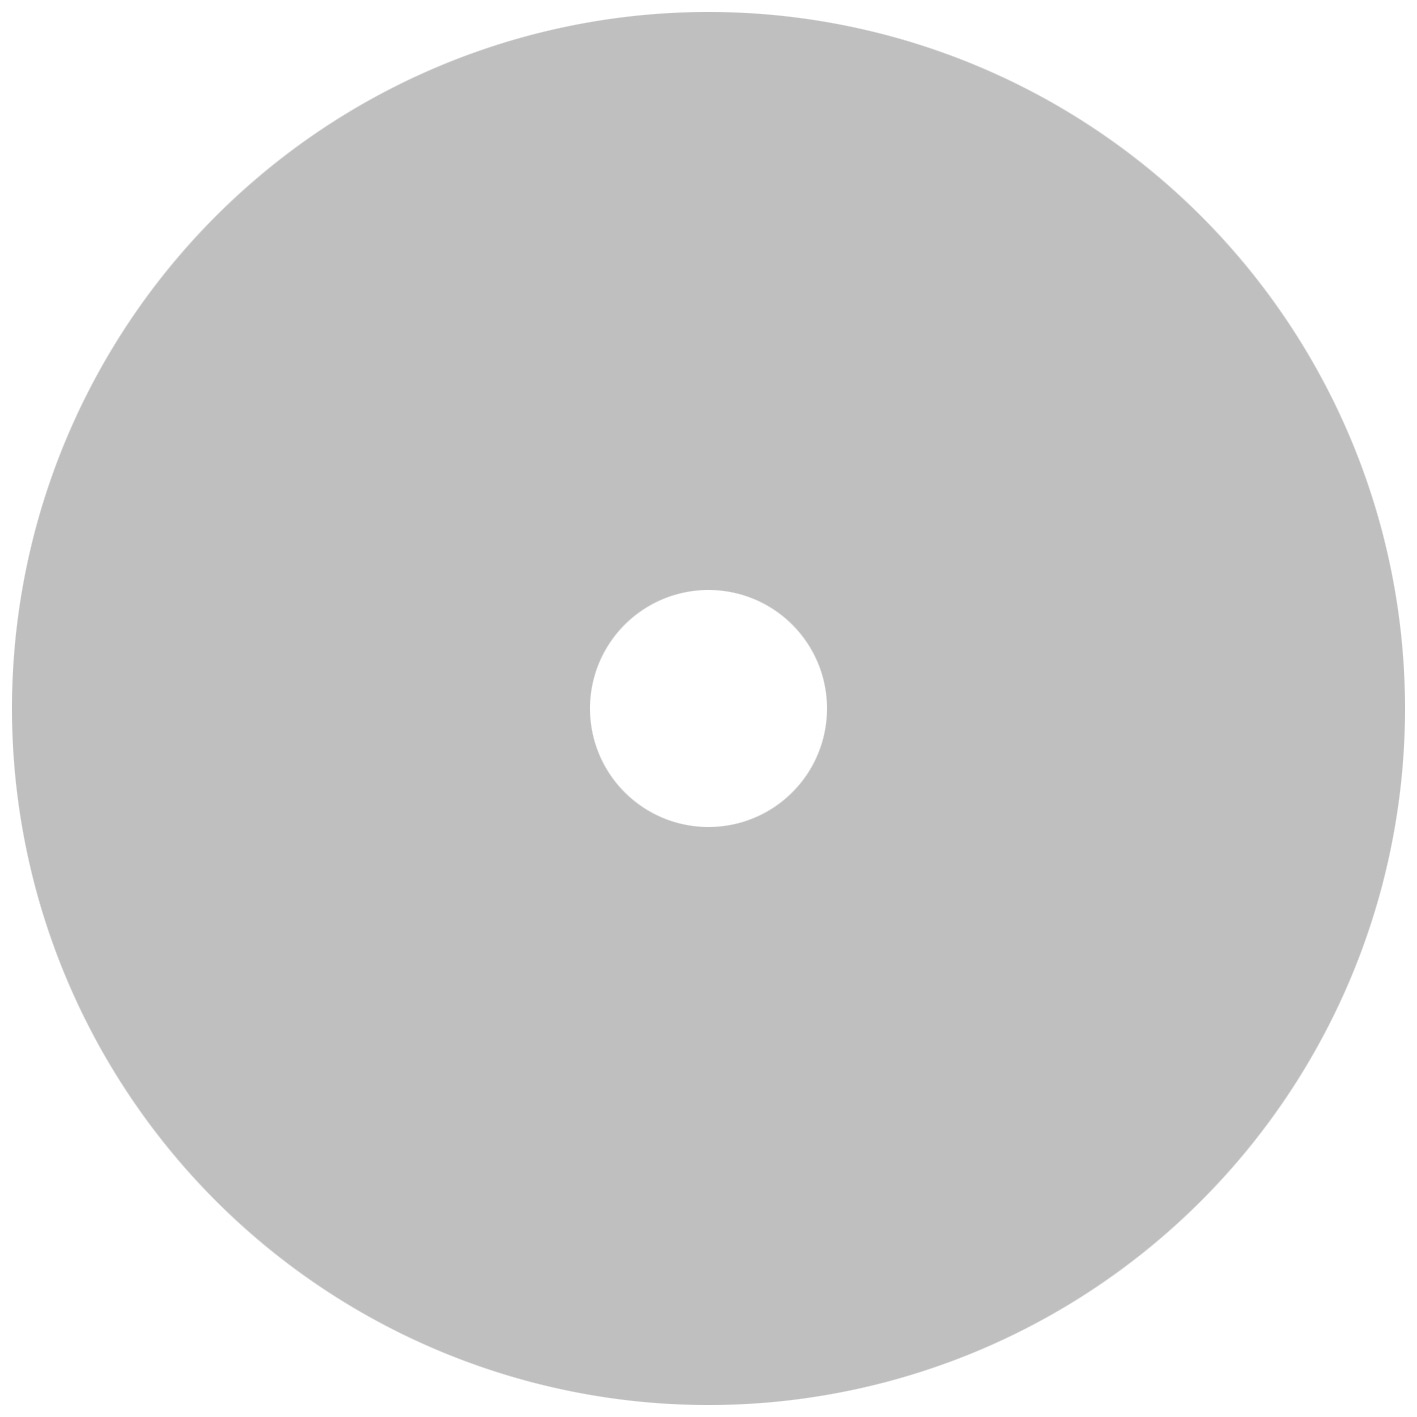 CD Printing, CD Labeling, DVD Printing, DVD Labeling